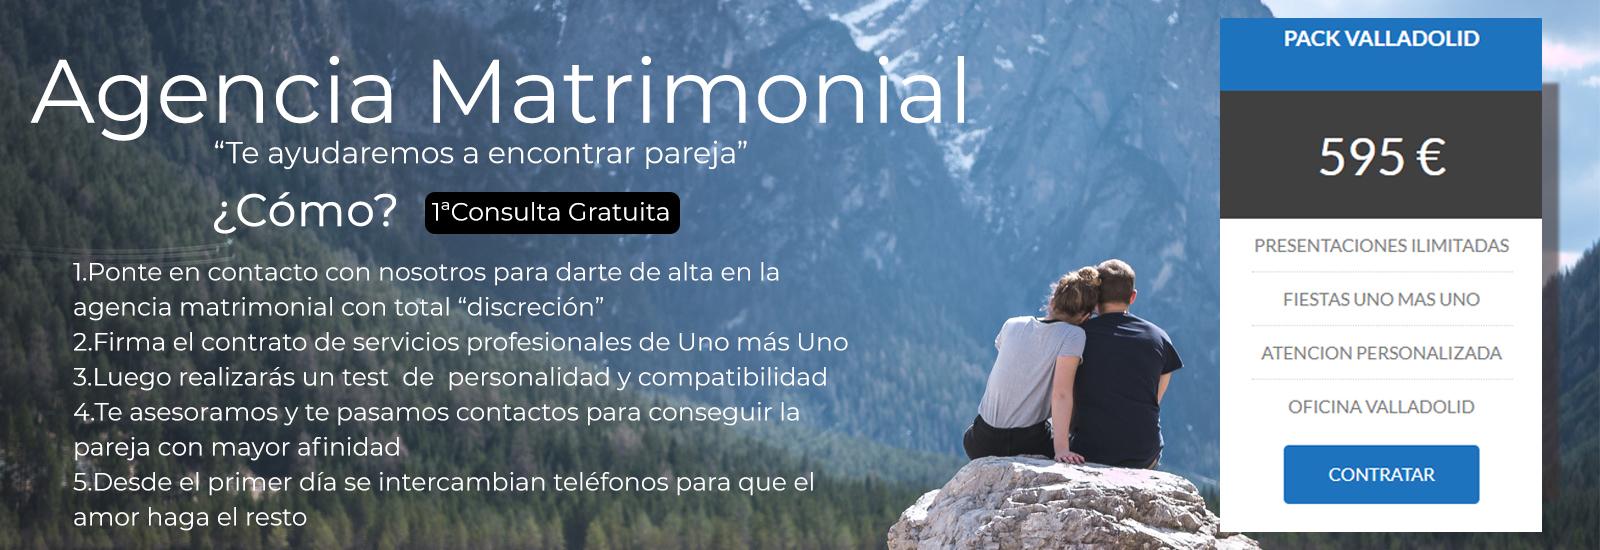 Agencia matrimonial valladolid [PUNIQRANDLINE-(au-dating-names.txt) 45